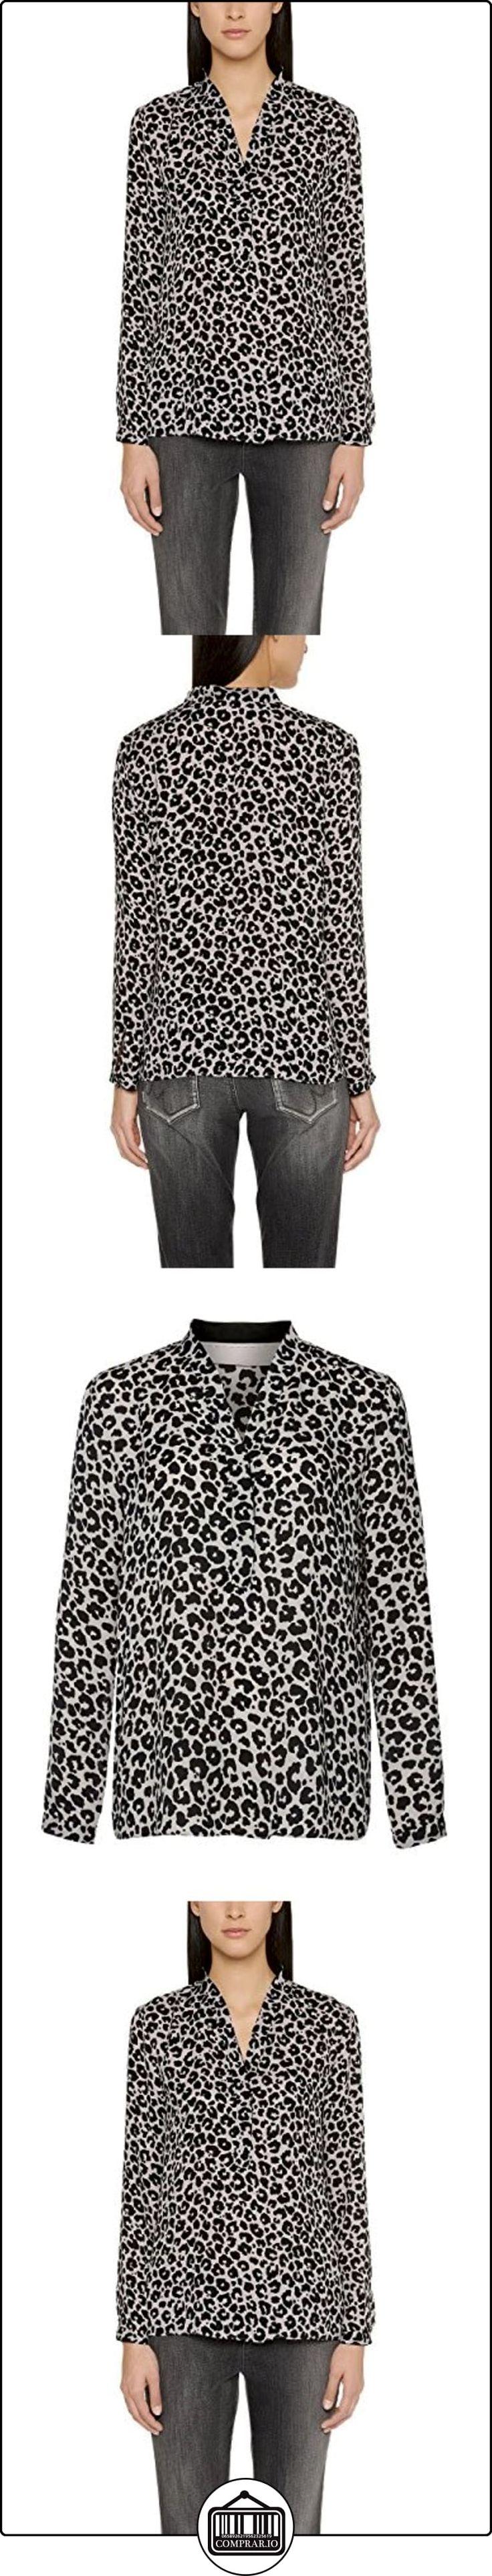 Marc Cain Additions FA 51.02 W44, Blusa para Mujer, Rosa (Conch 804), 44  ✿ Blusas y camisas ✿